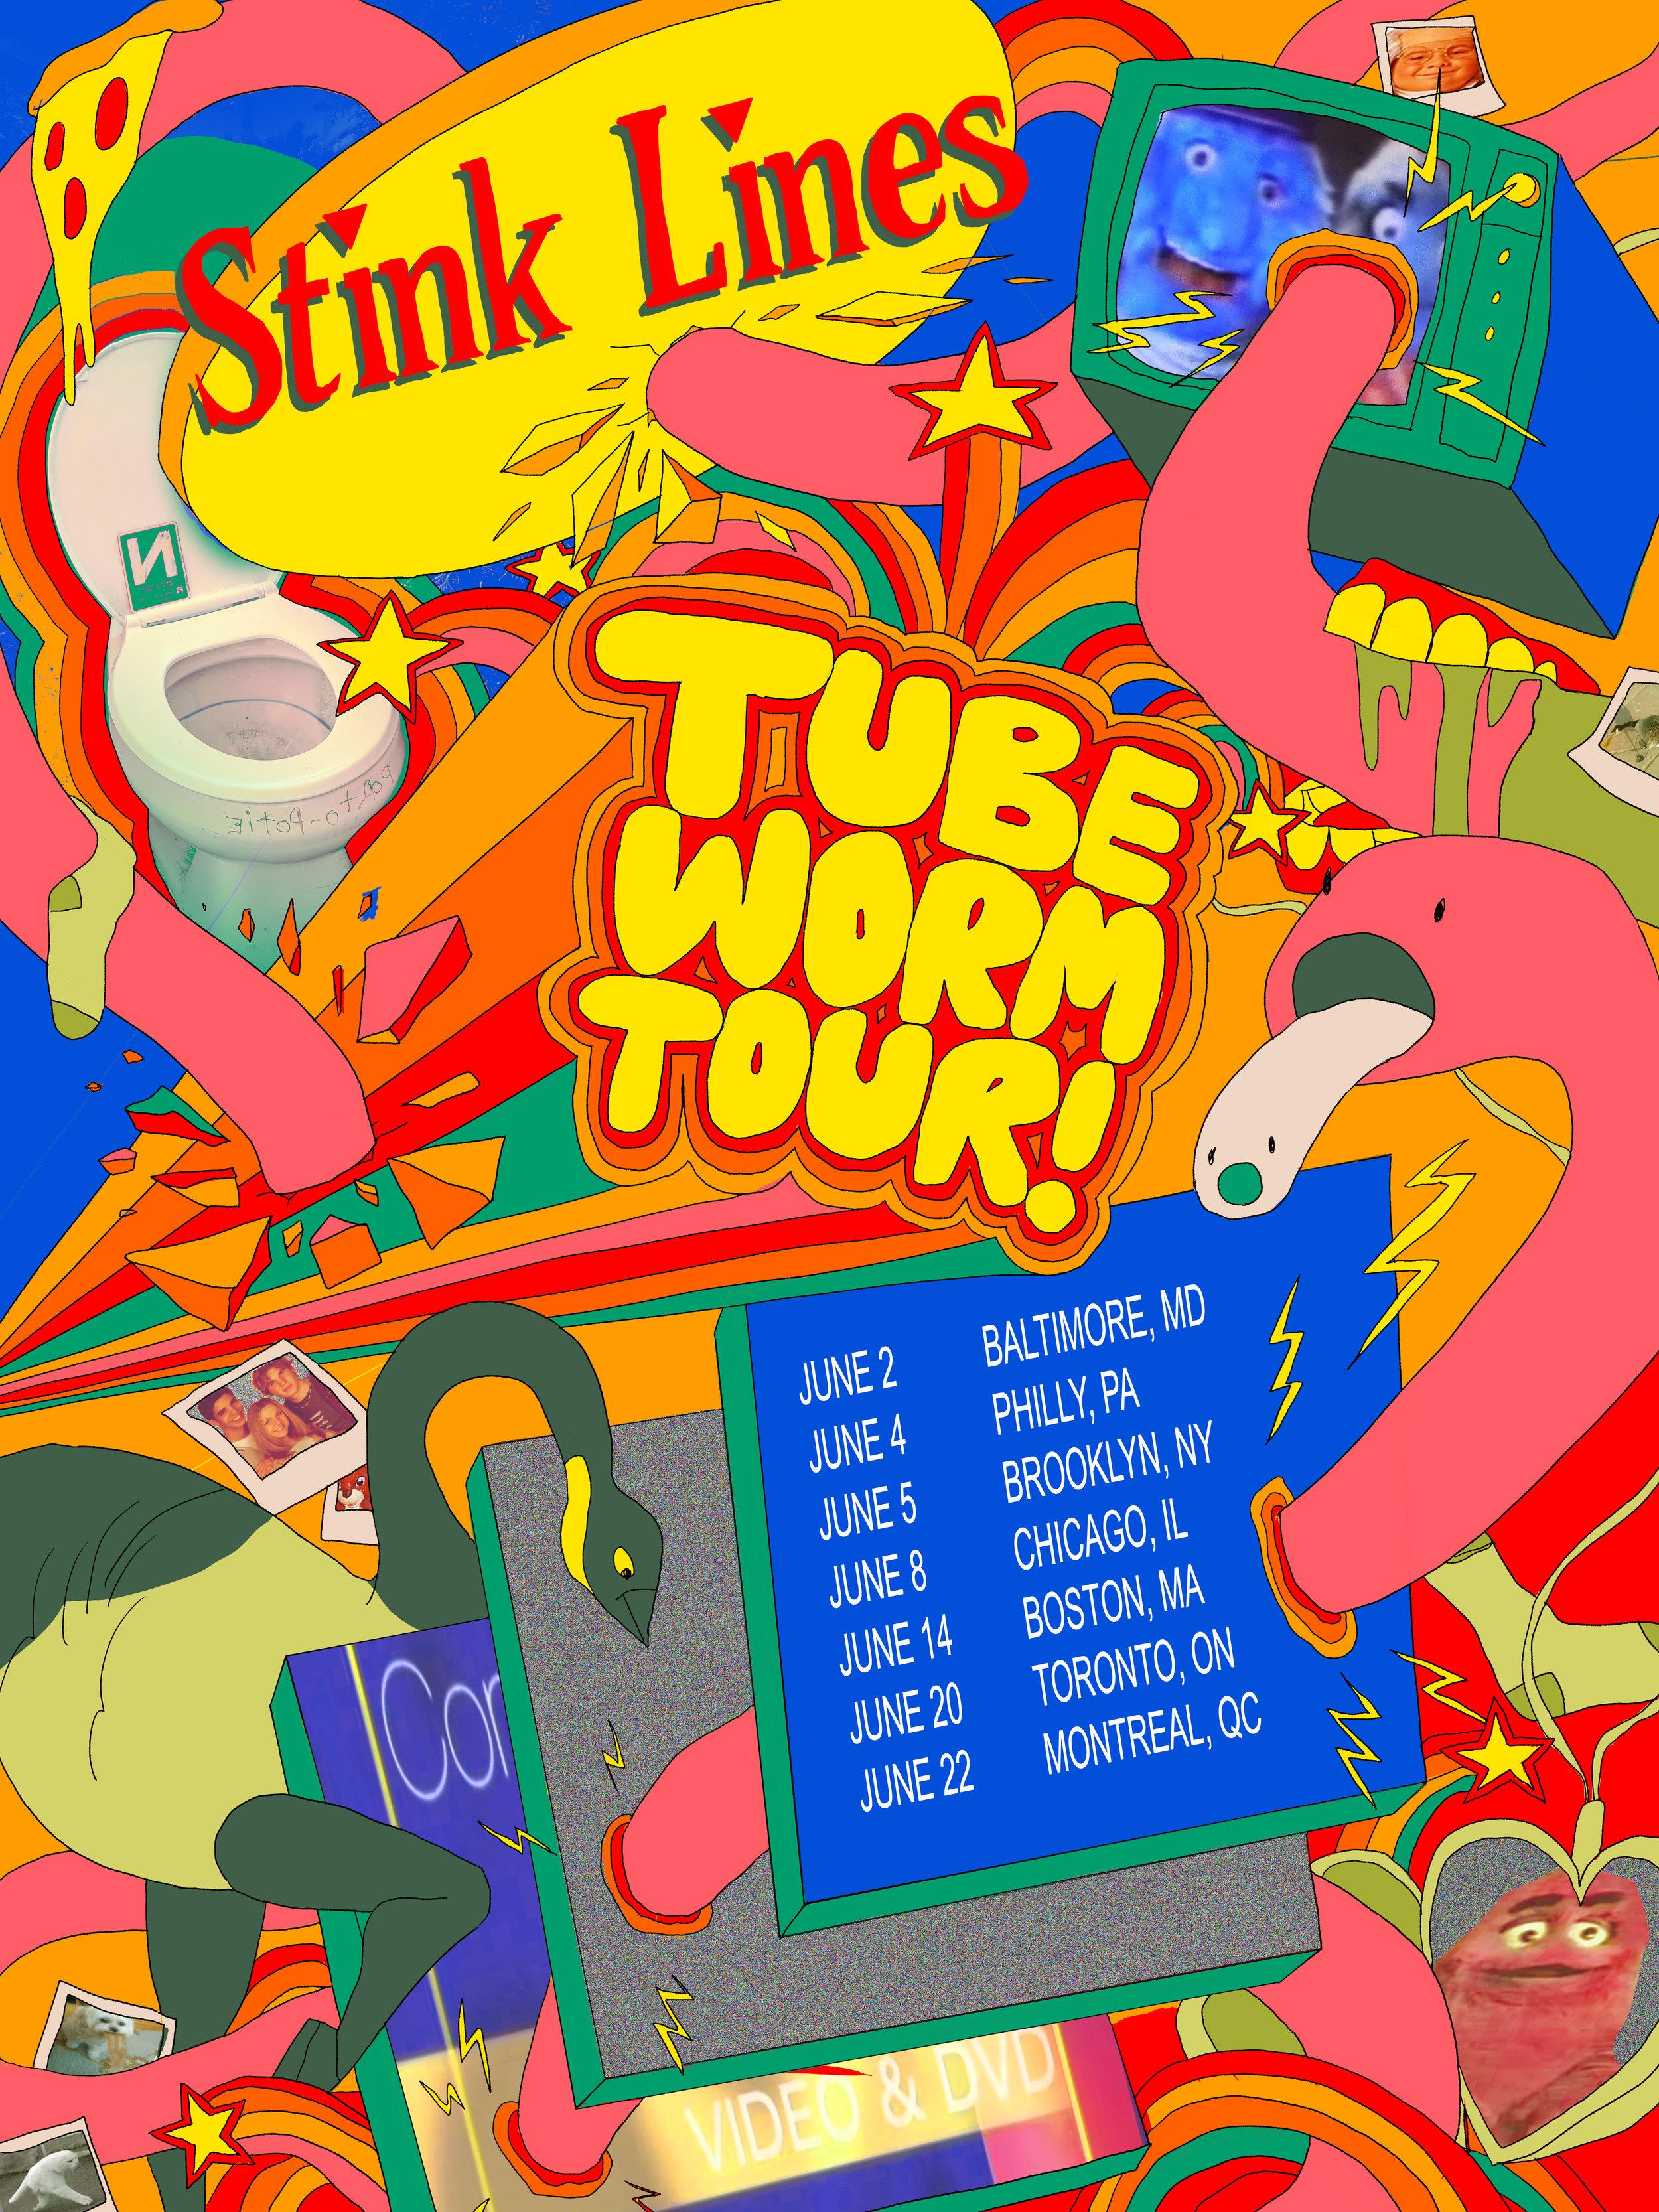 tubewormtour.jpg